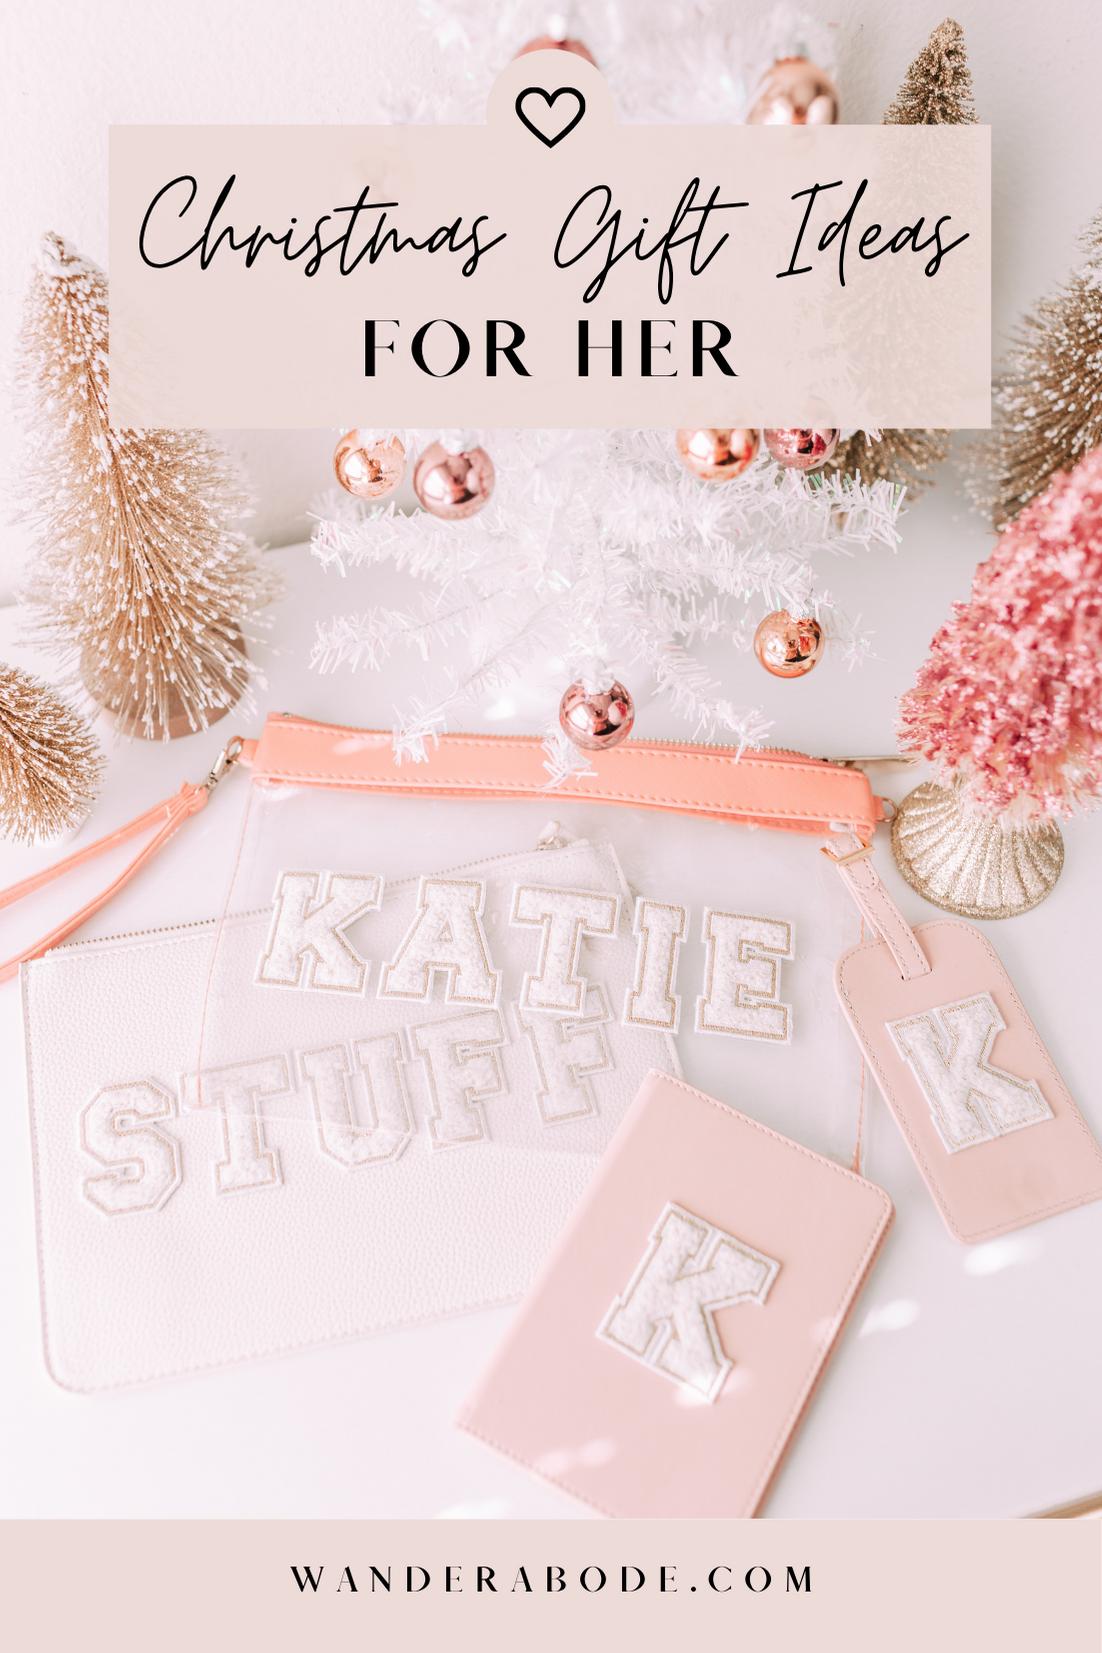 Christmas Gift Ideas for Her // wanderabode.com